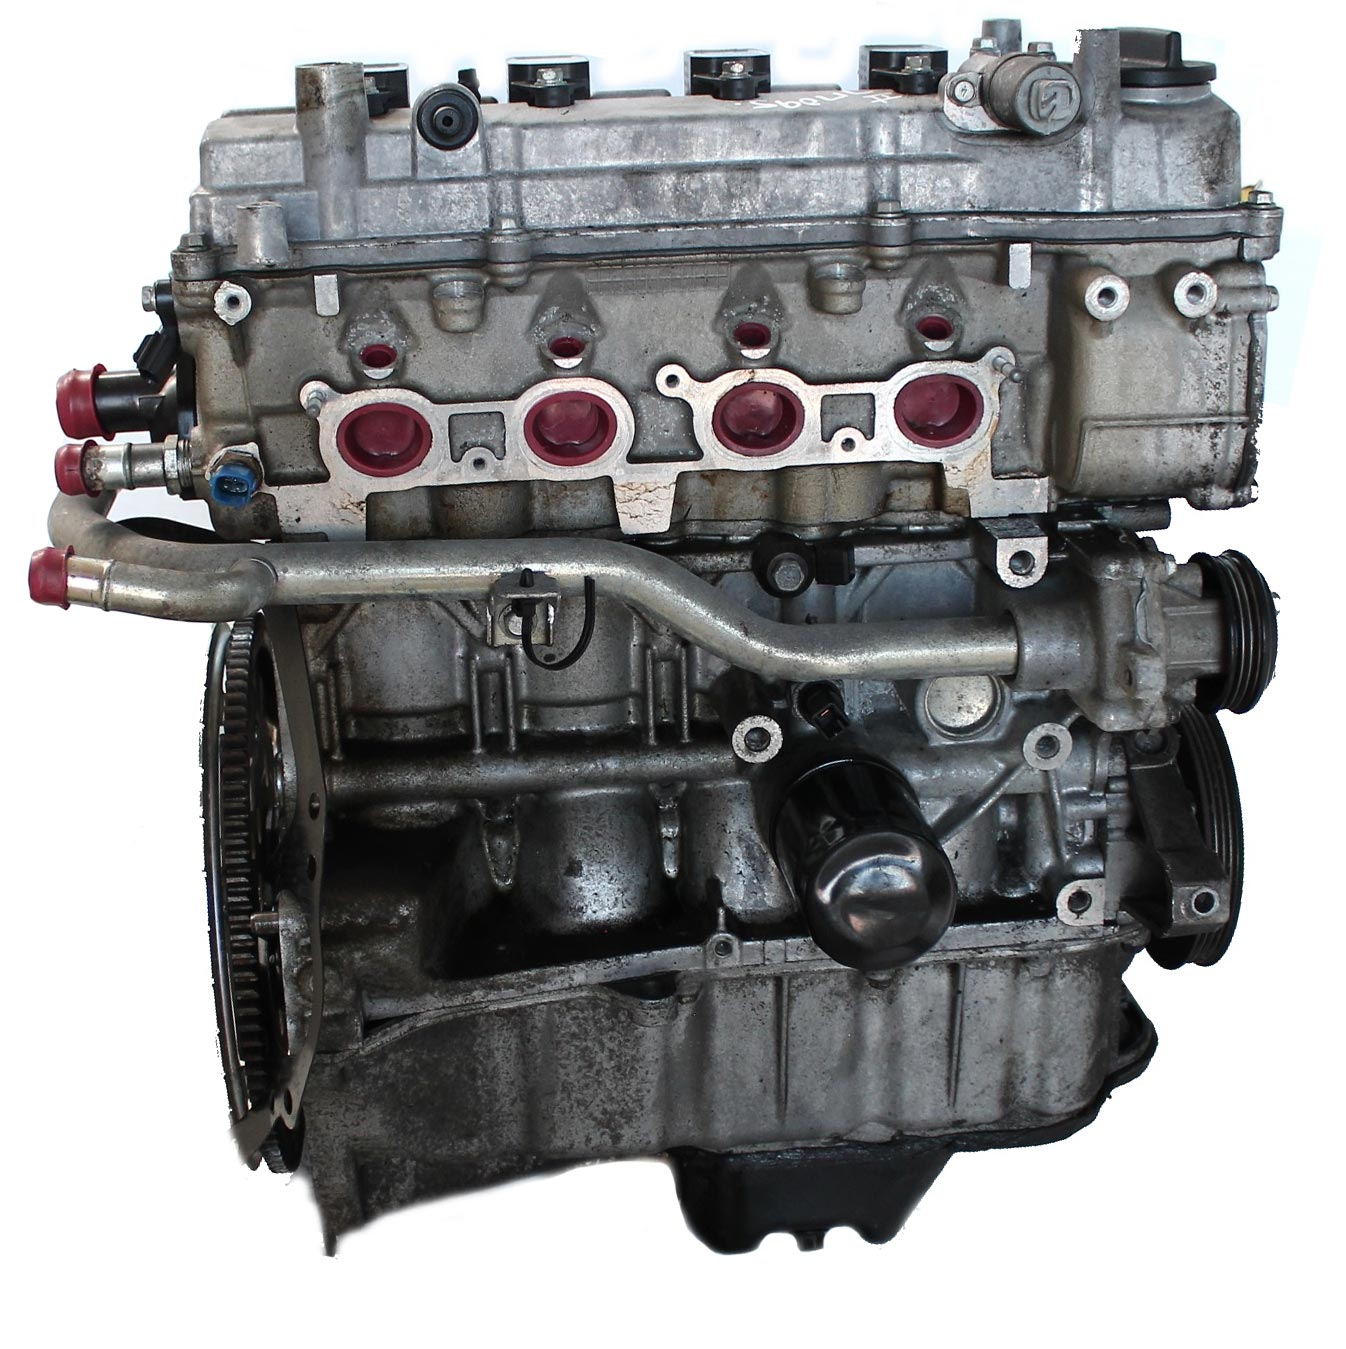 Motor 2008 für Nissan Micra Note 1,4 16V CR14DE CR14 nur für Automatikgetriebe